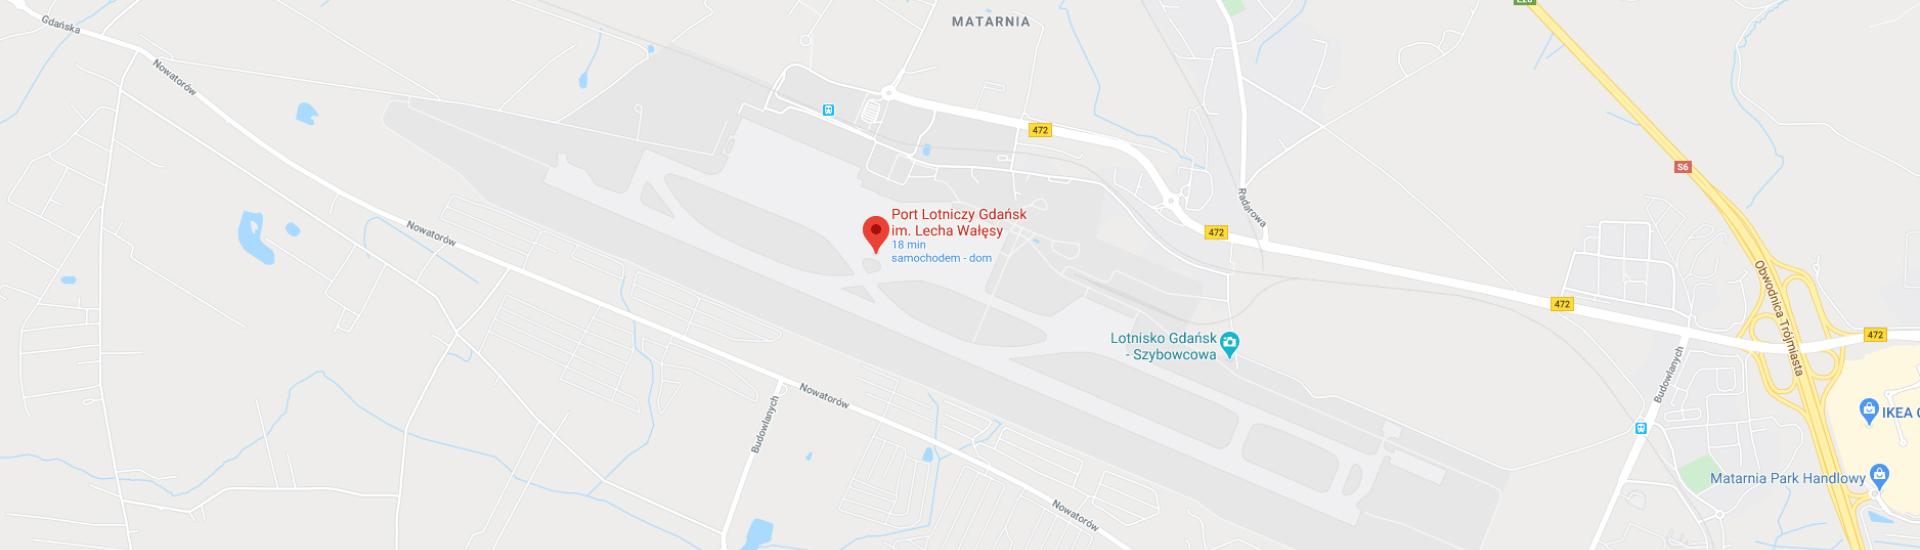 Mapa, placeholder